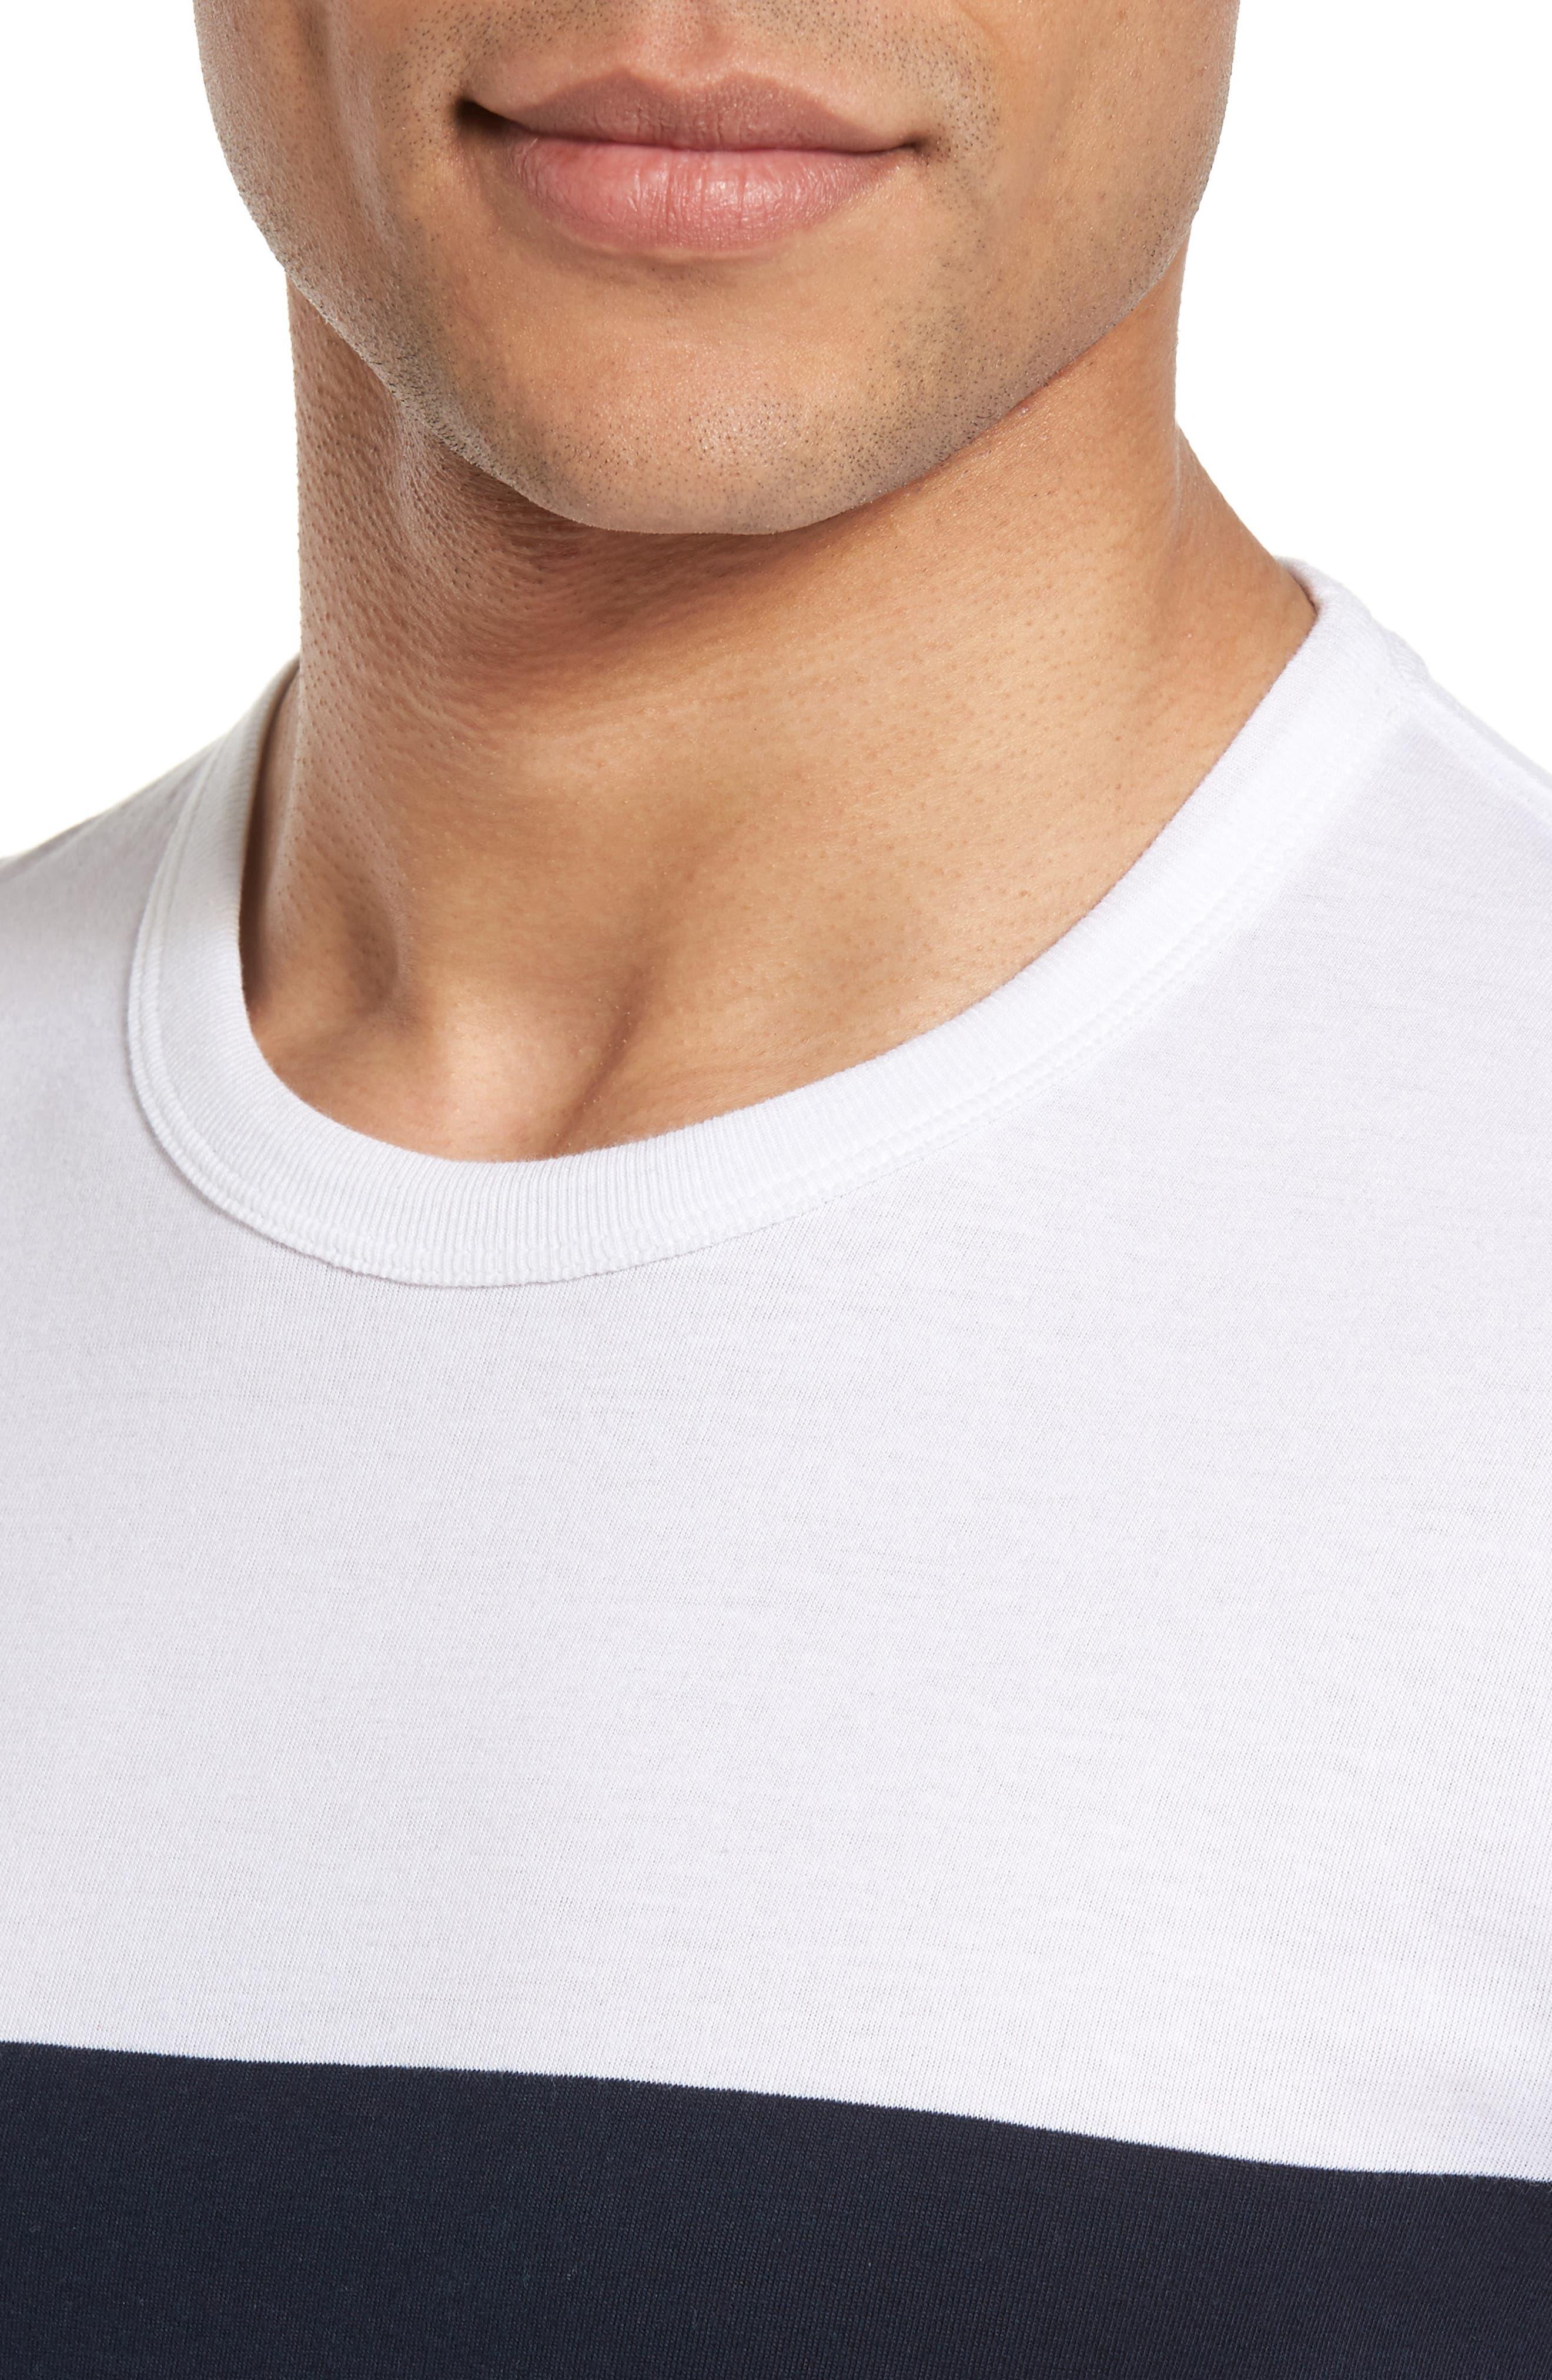 Senior Stripe Slim Fit T-Shirt,                             Alternate thumbnail 4, color,                             WHITE